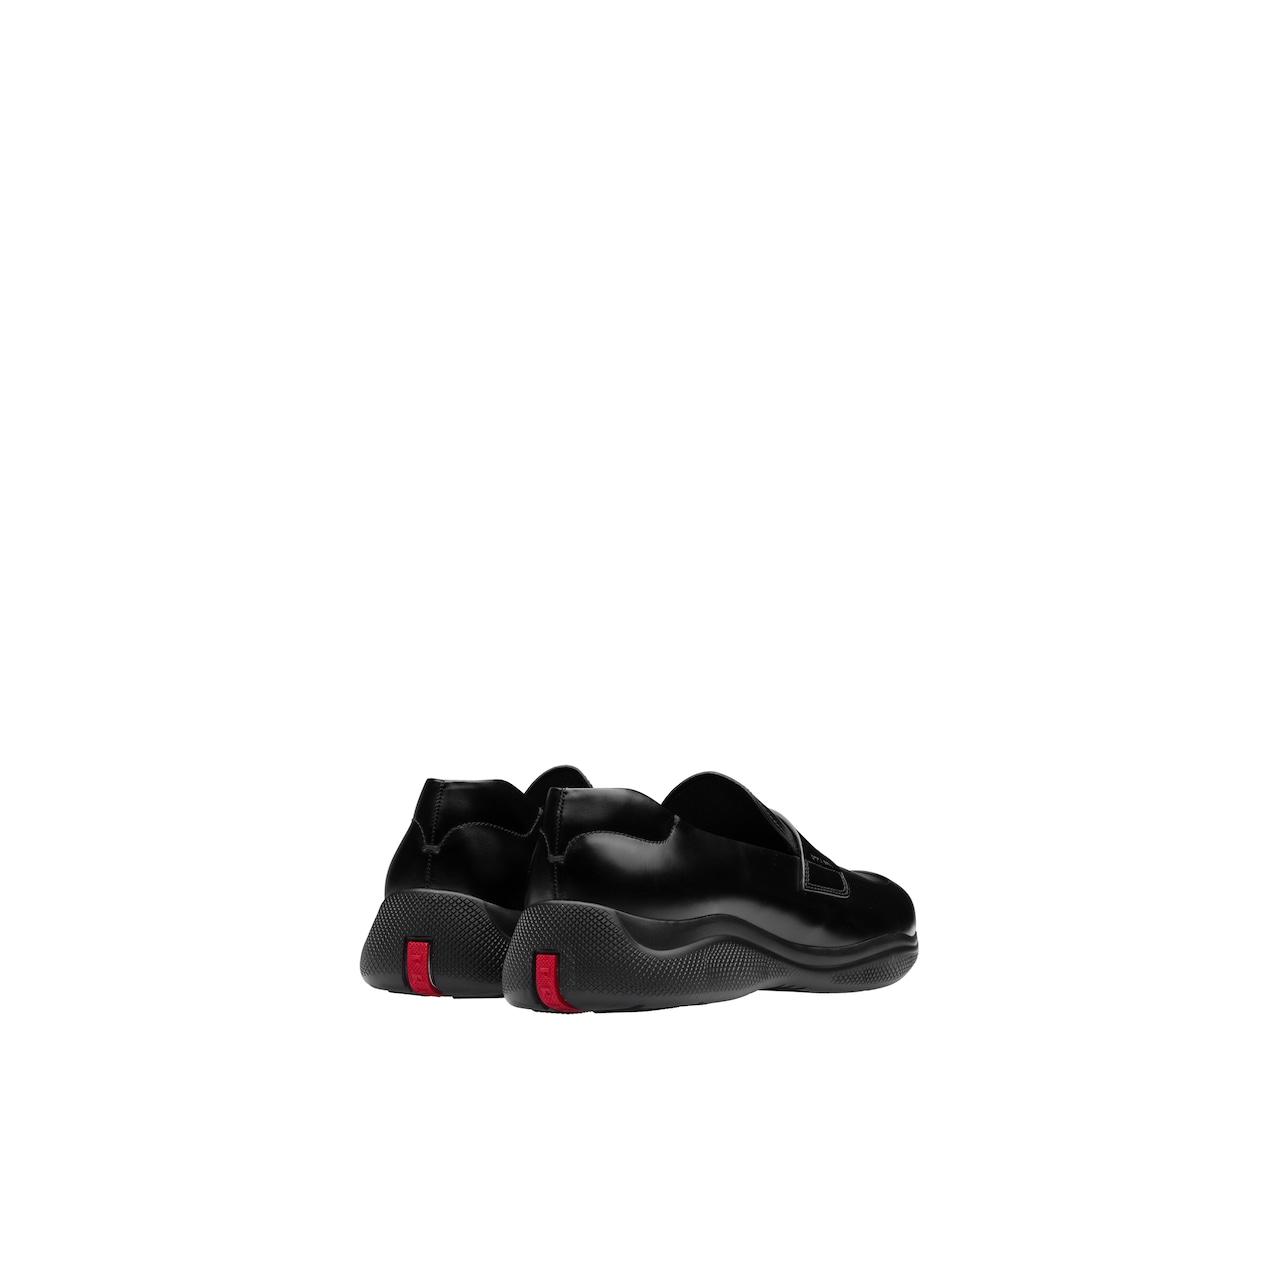 Prada 哑色皮革乐福鞋 4